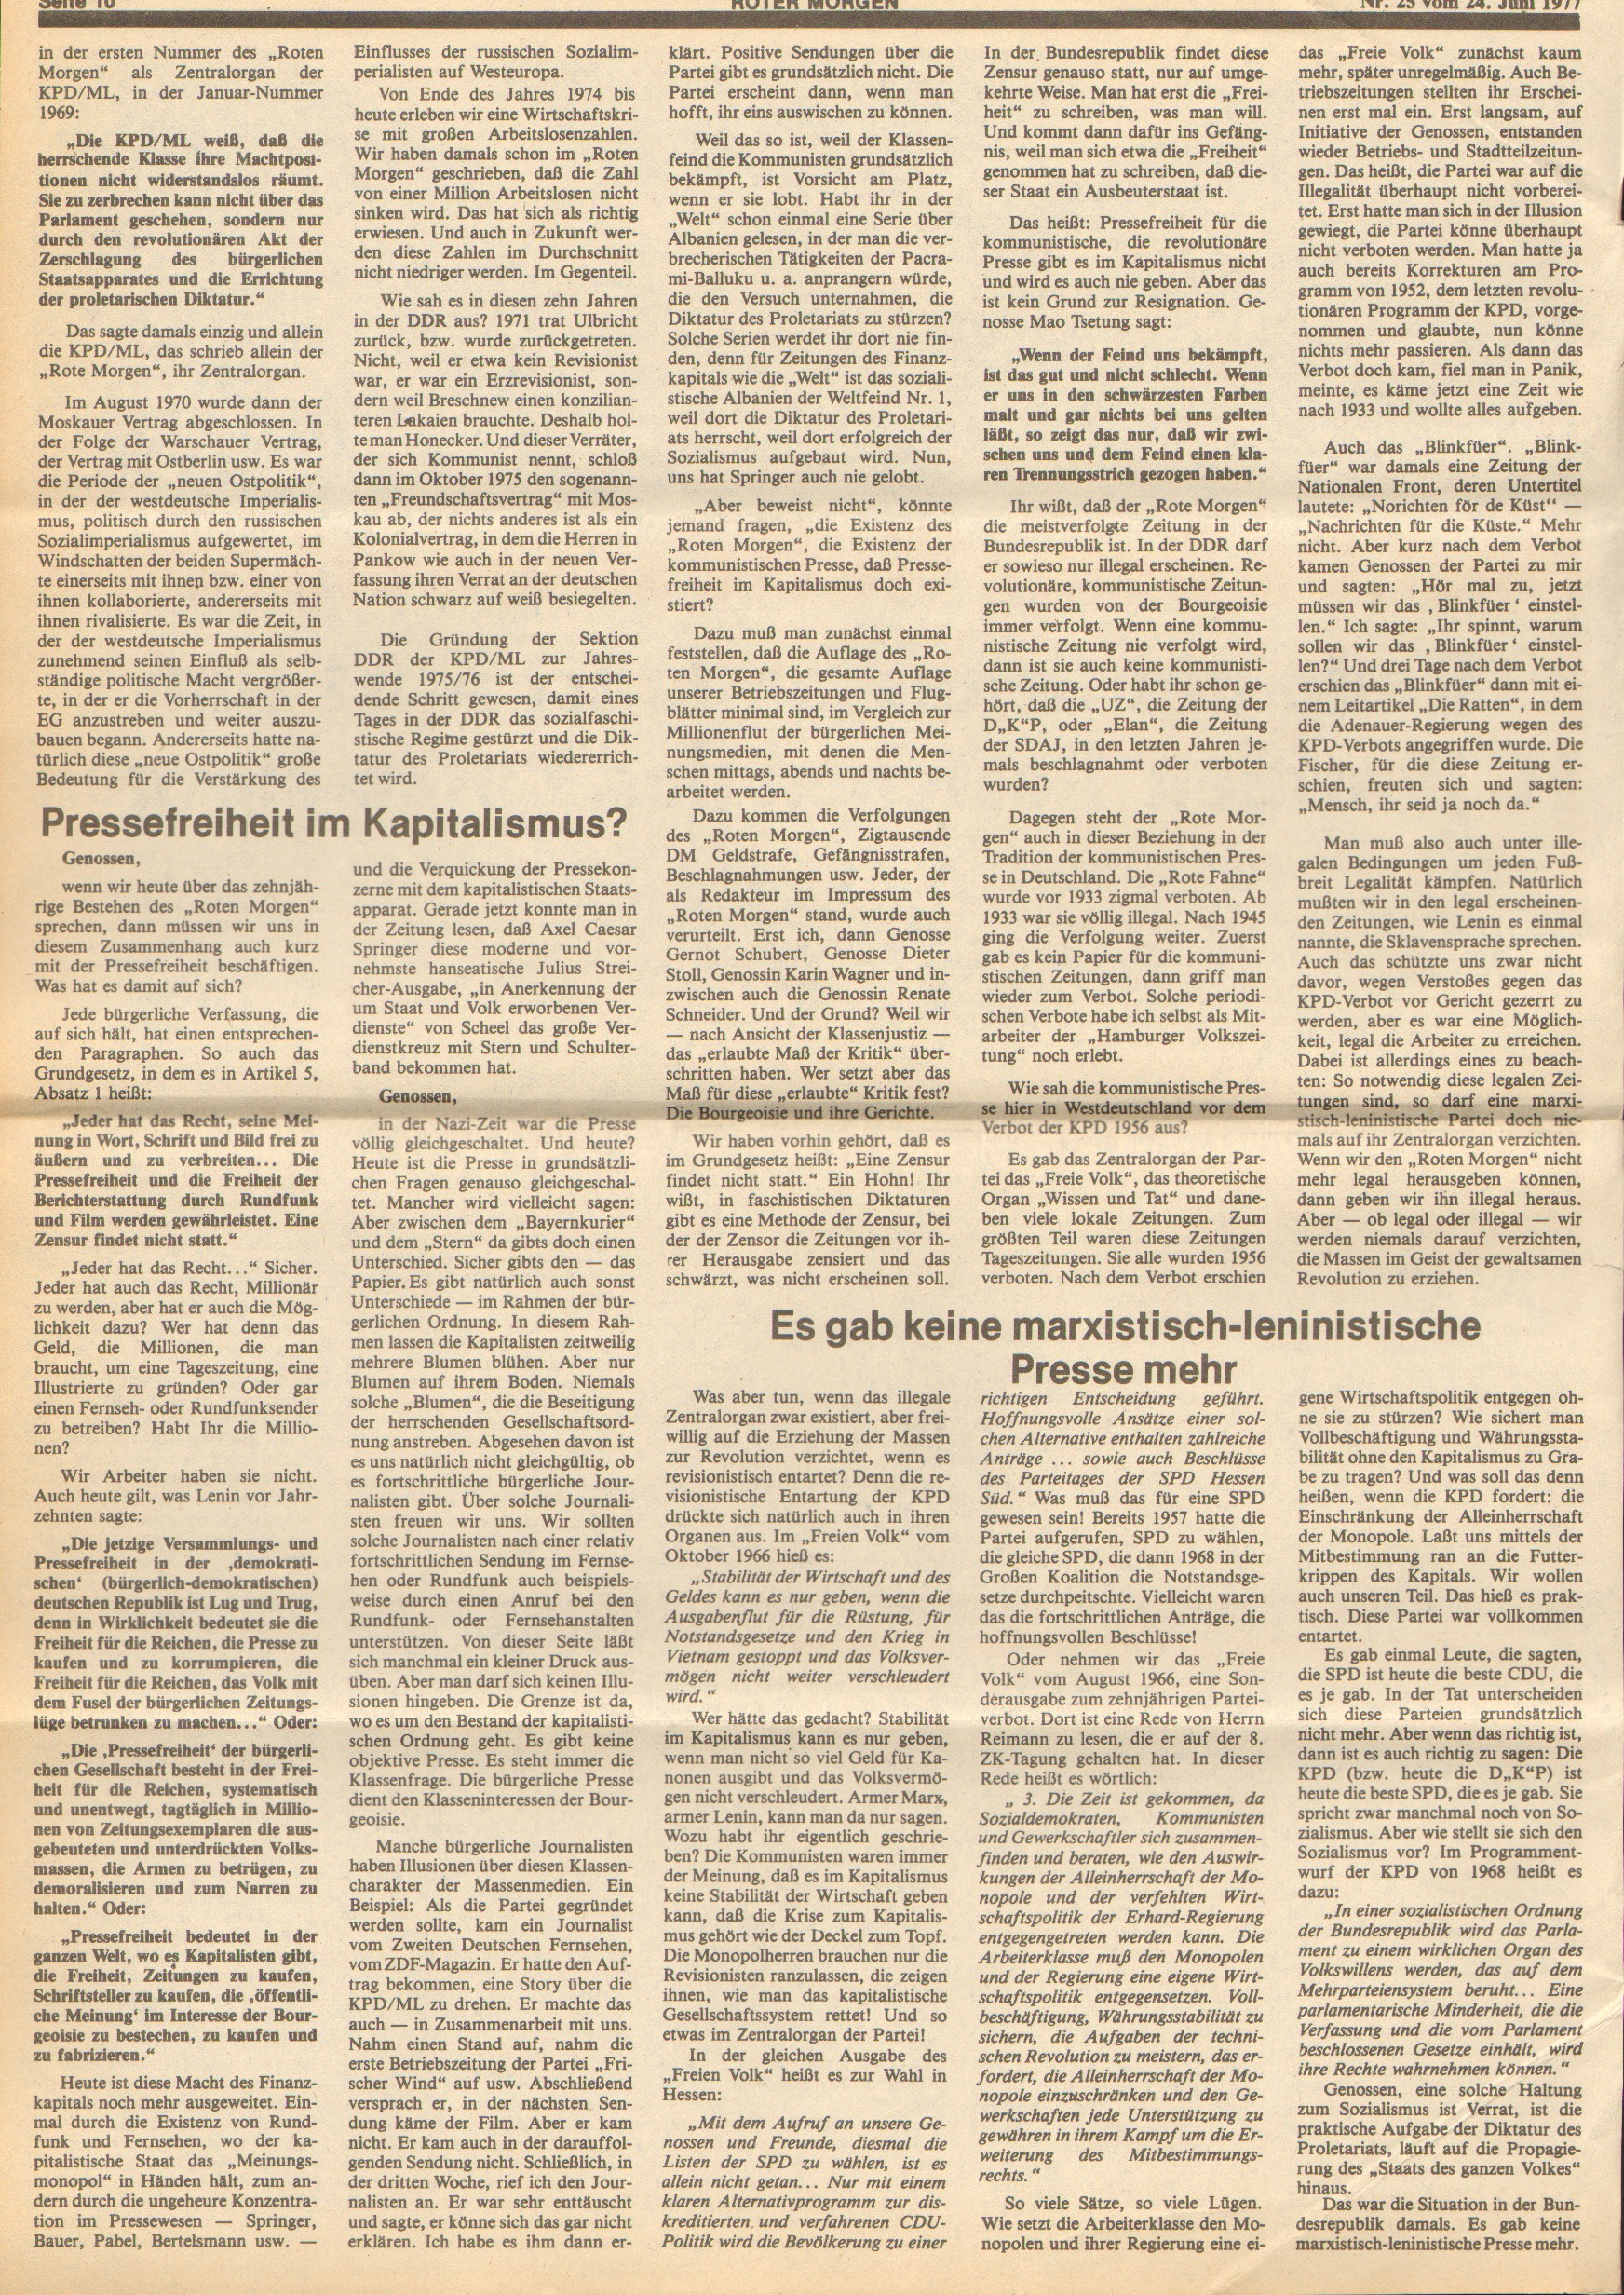 Roter Morgen, 11. Jg., 24. Juni 1977, Nr. 25, Seite 10